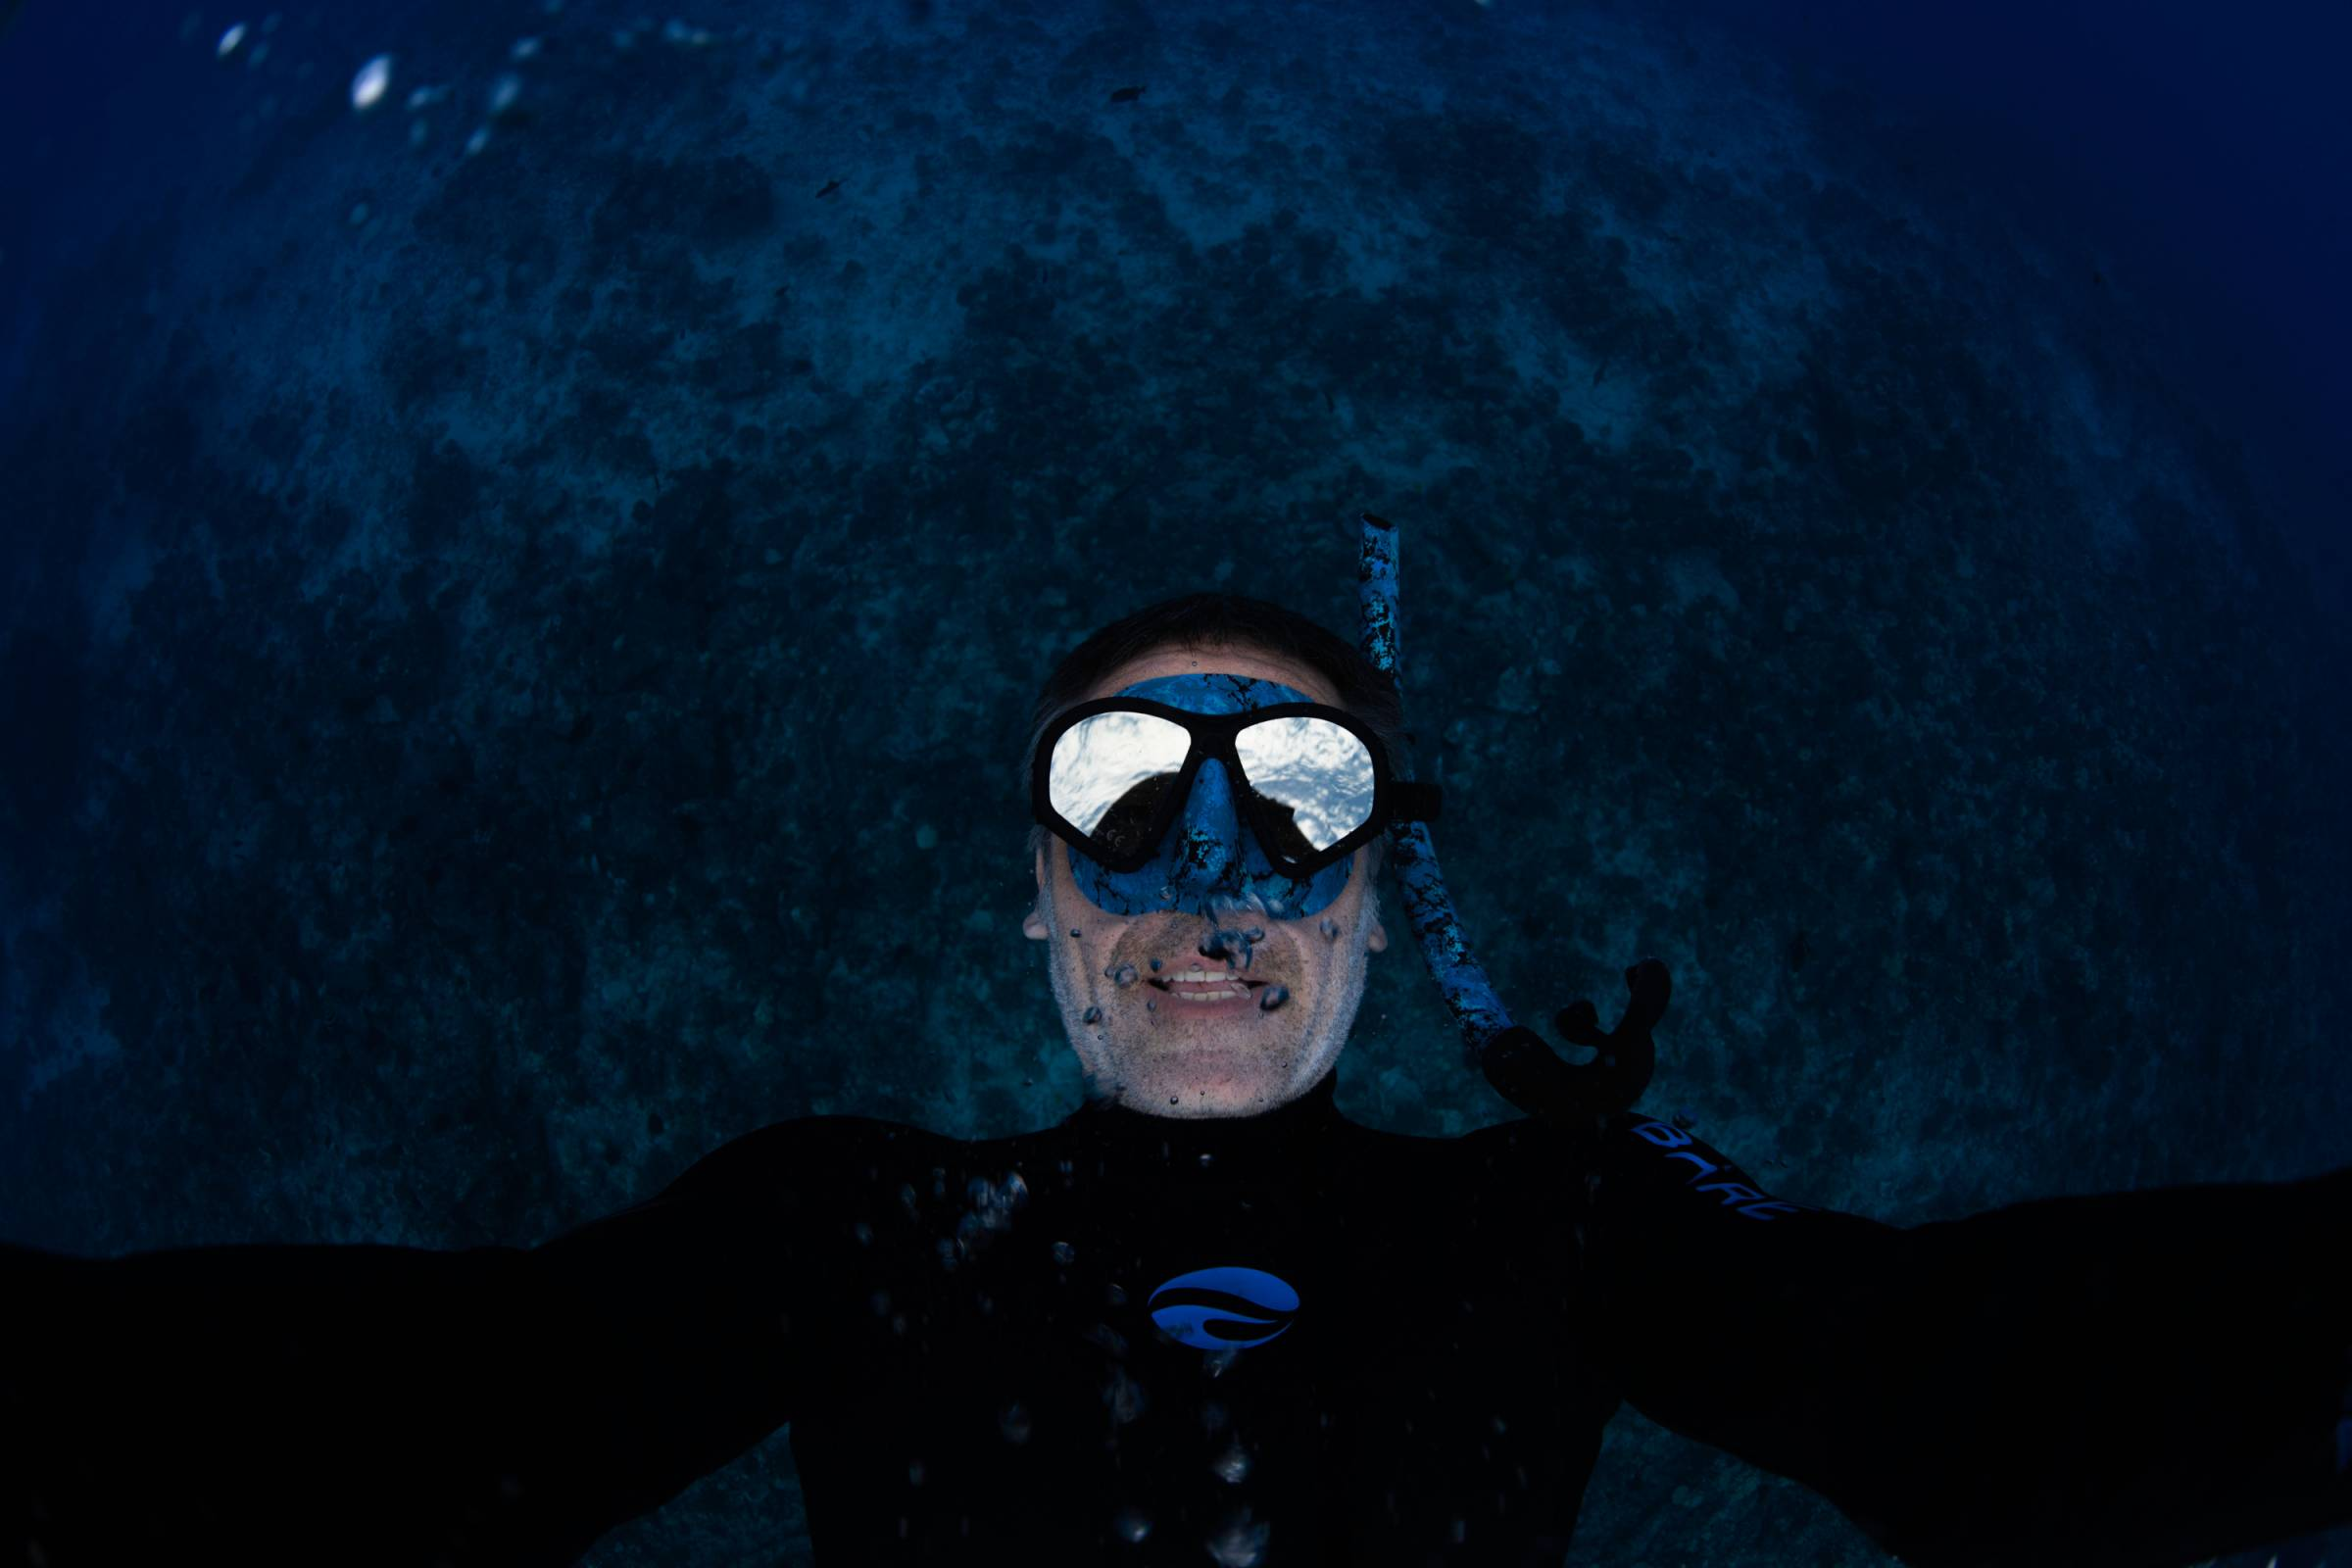 Oceanic Predator mask reflects sky